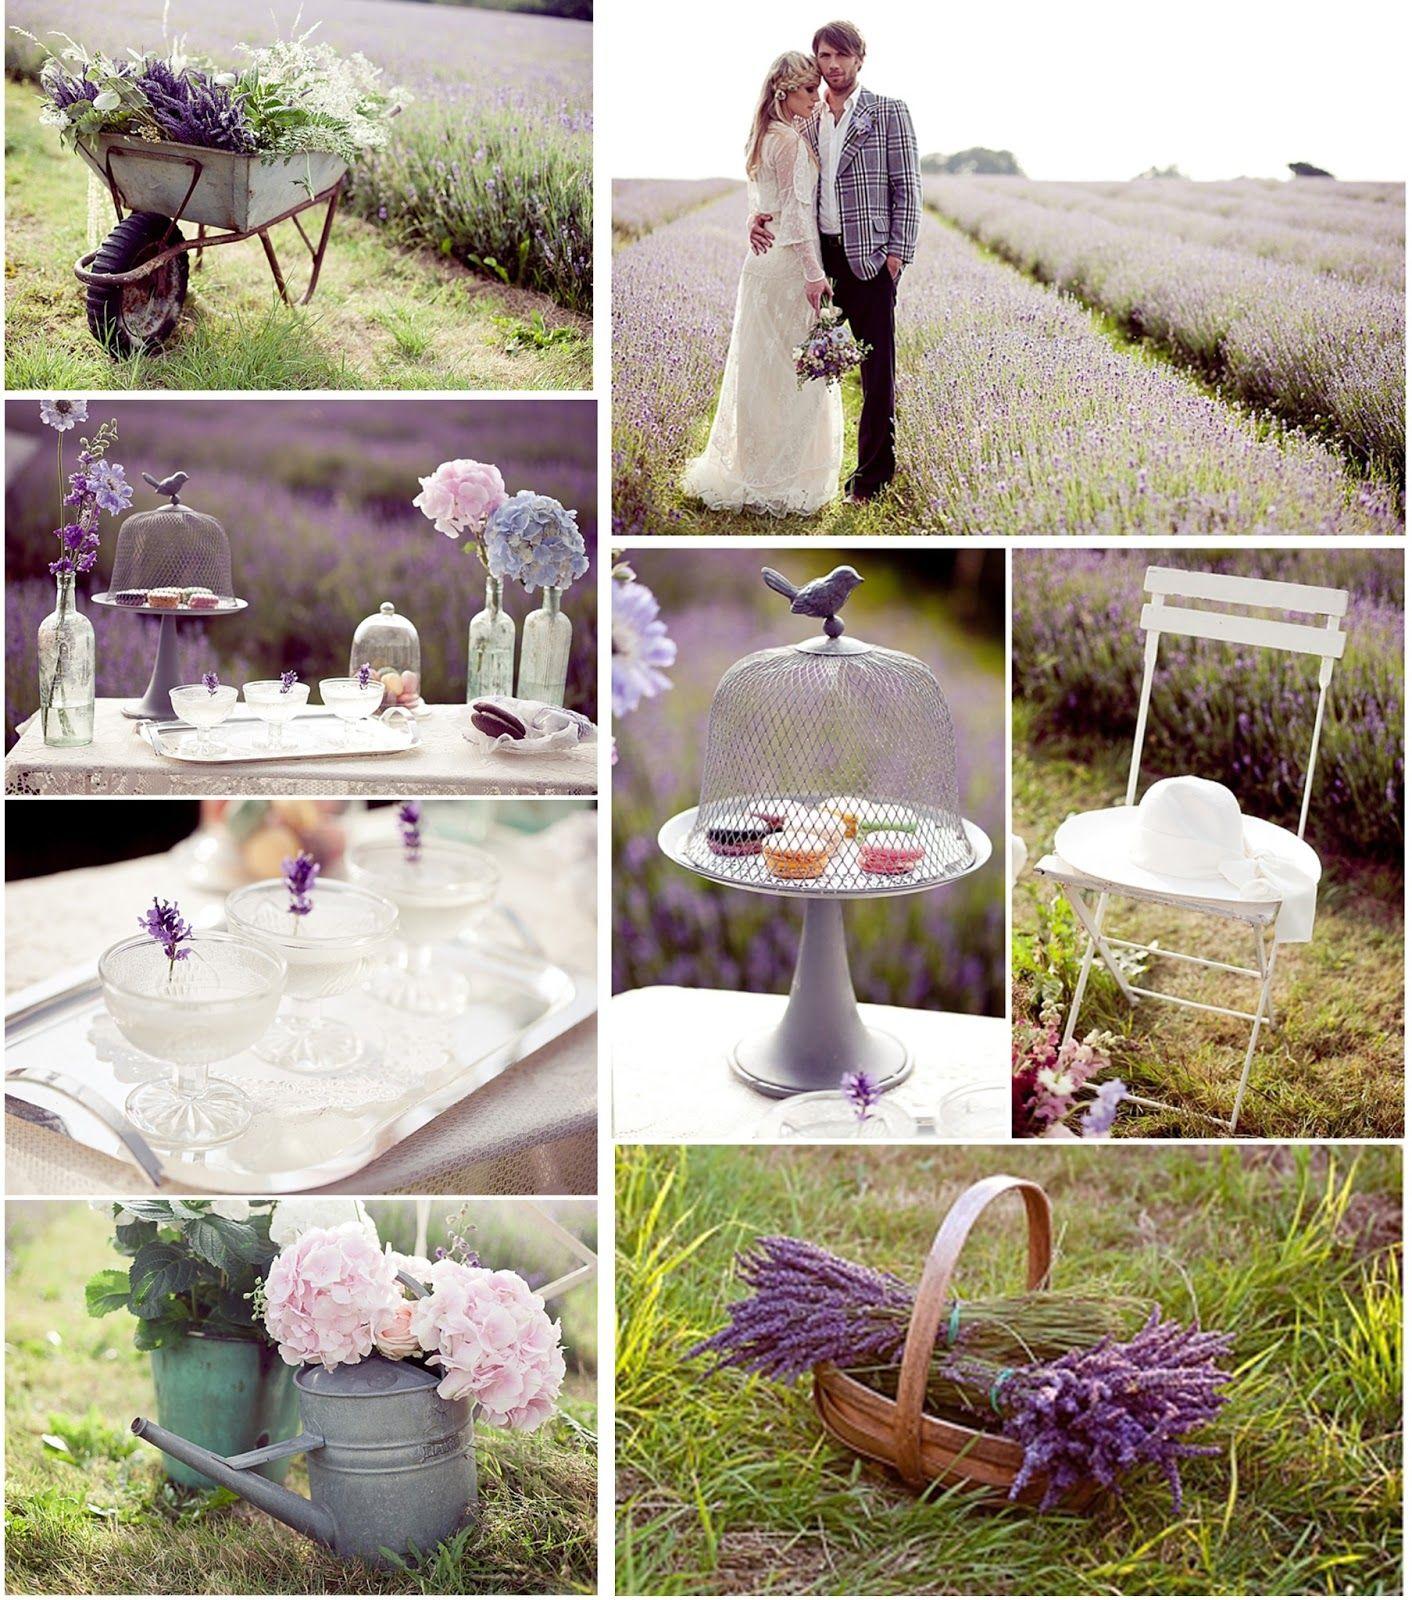 Bodas decoraci n bodas matrimonio bodas campo - Decoracion jardin boda civil ...